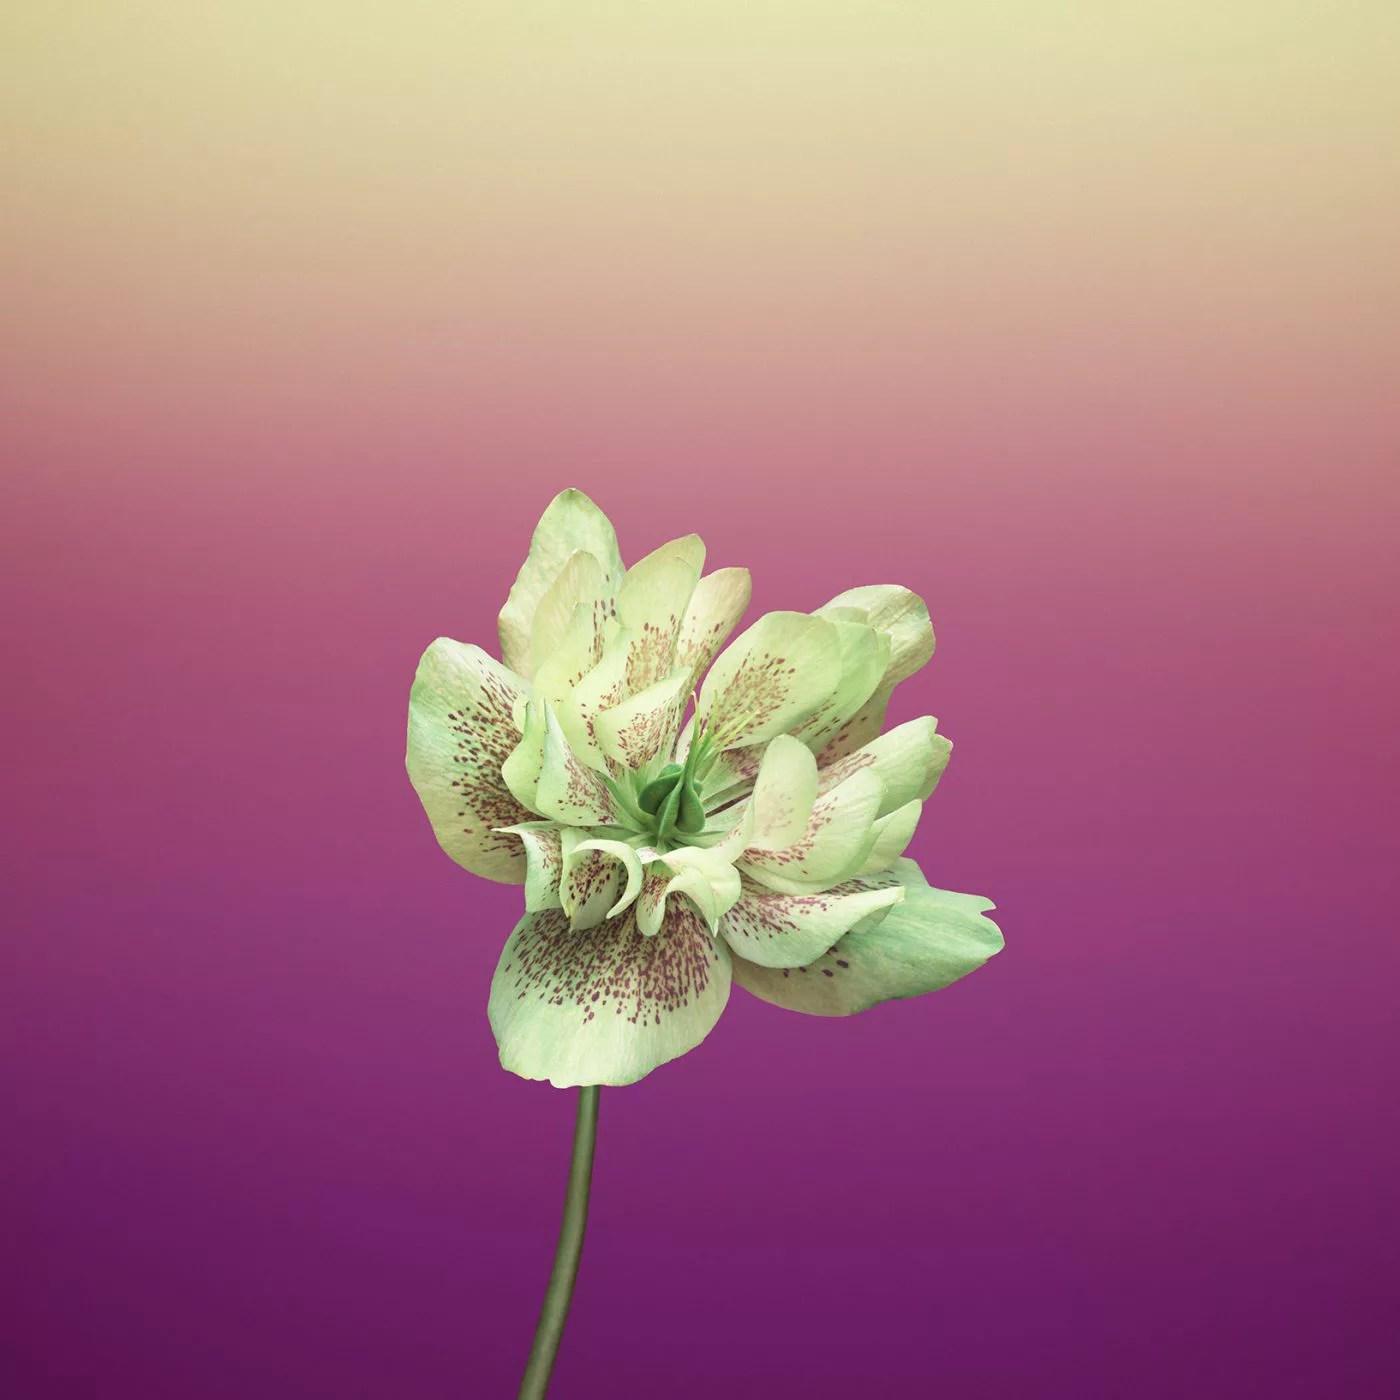 ios_11_gm_wallpaper_flower_helleborus.jpg